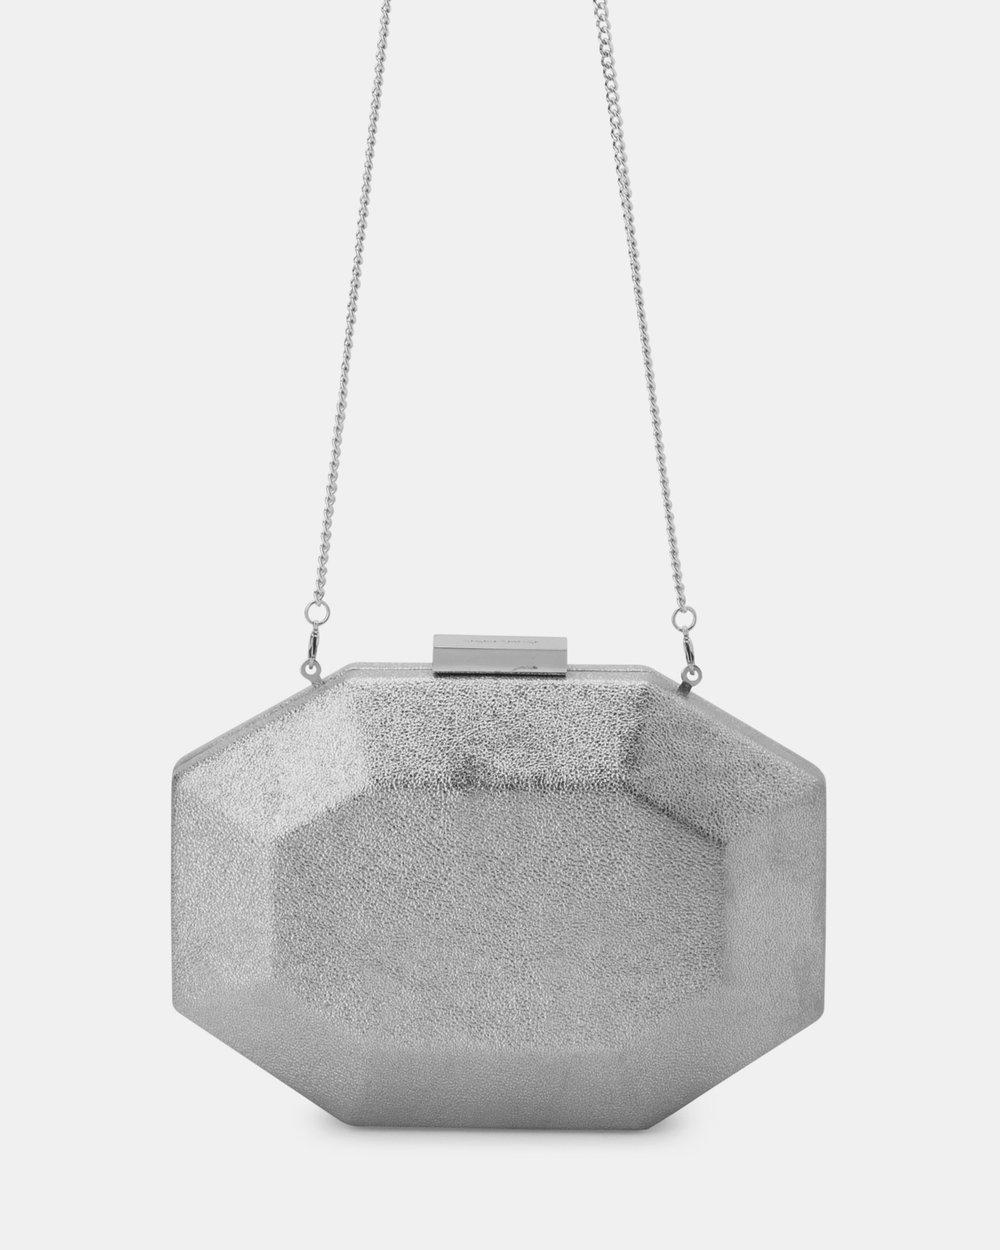 Olga Berg GALACTIC Sparkle Clutch in Silver Bag